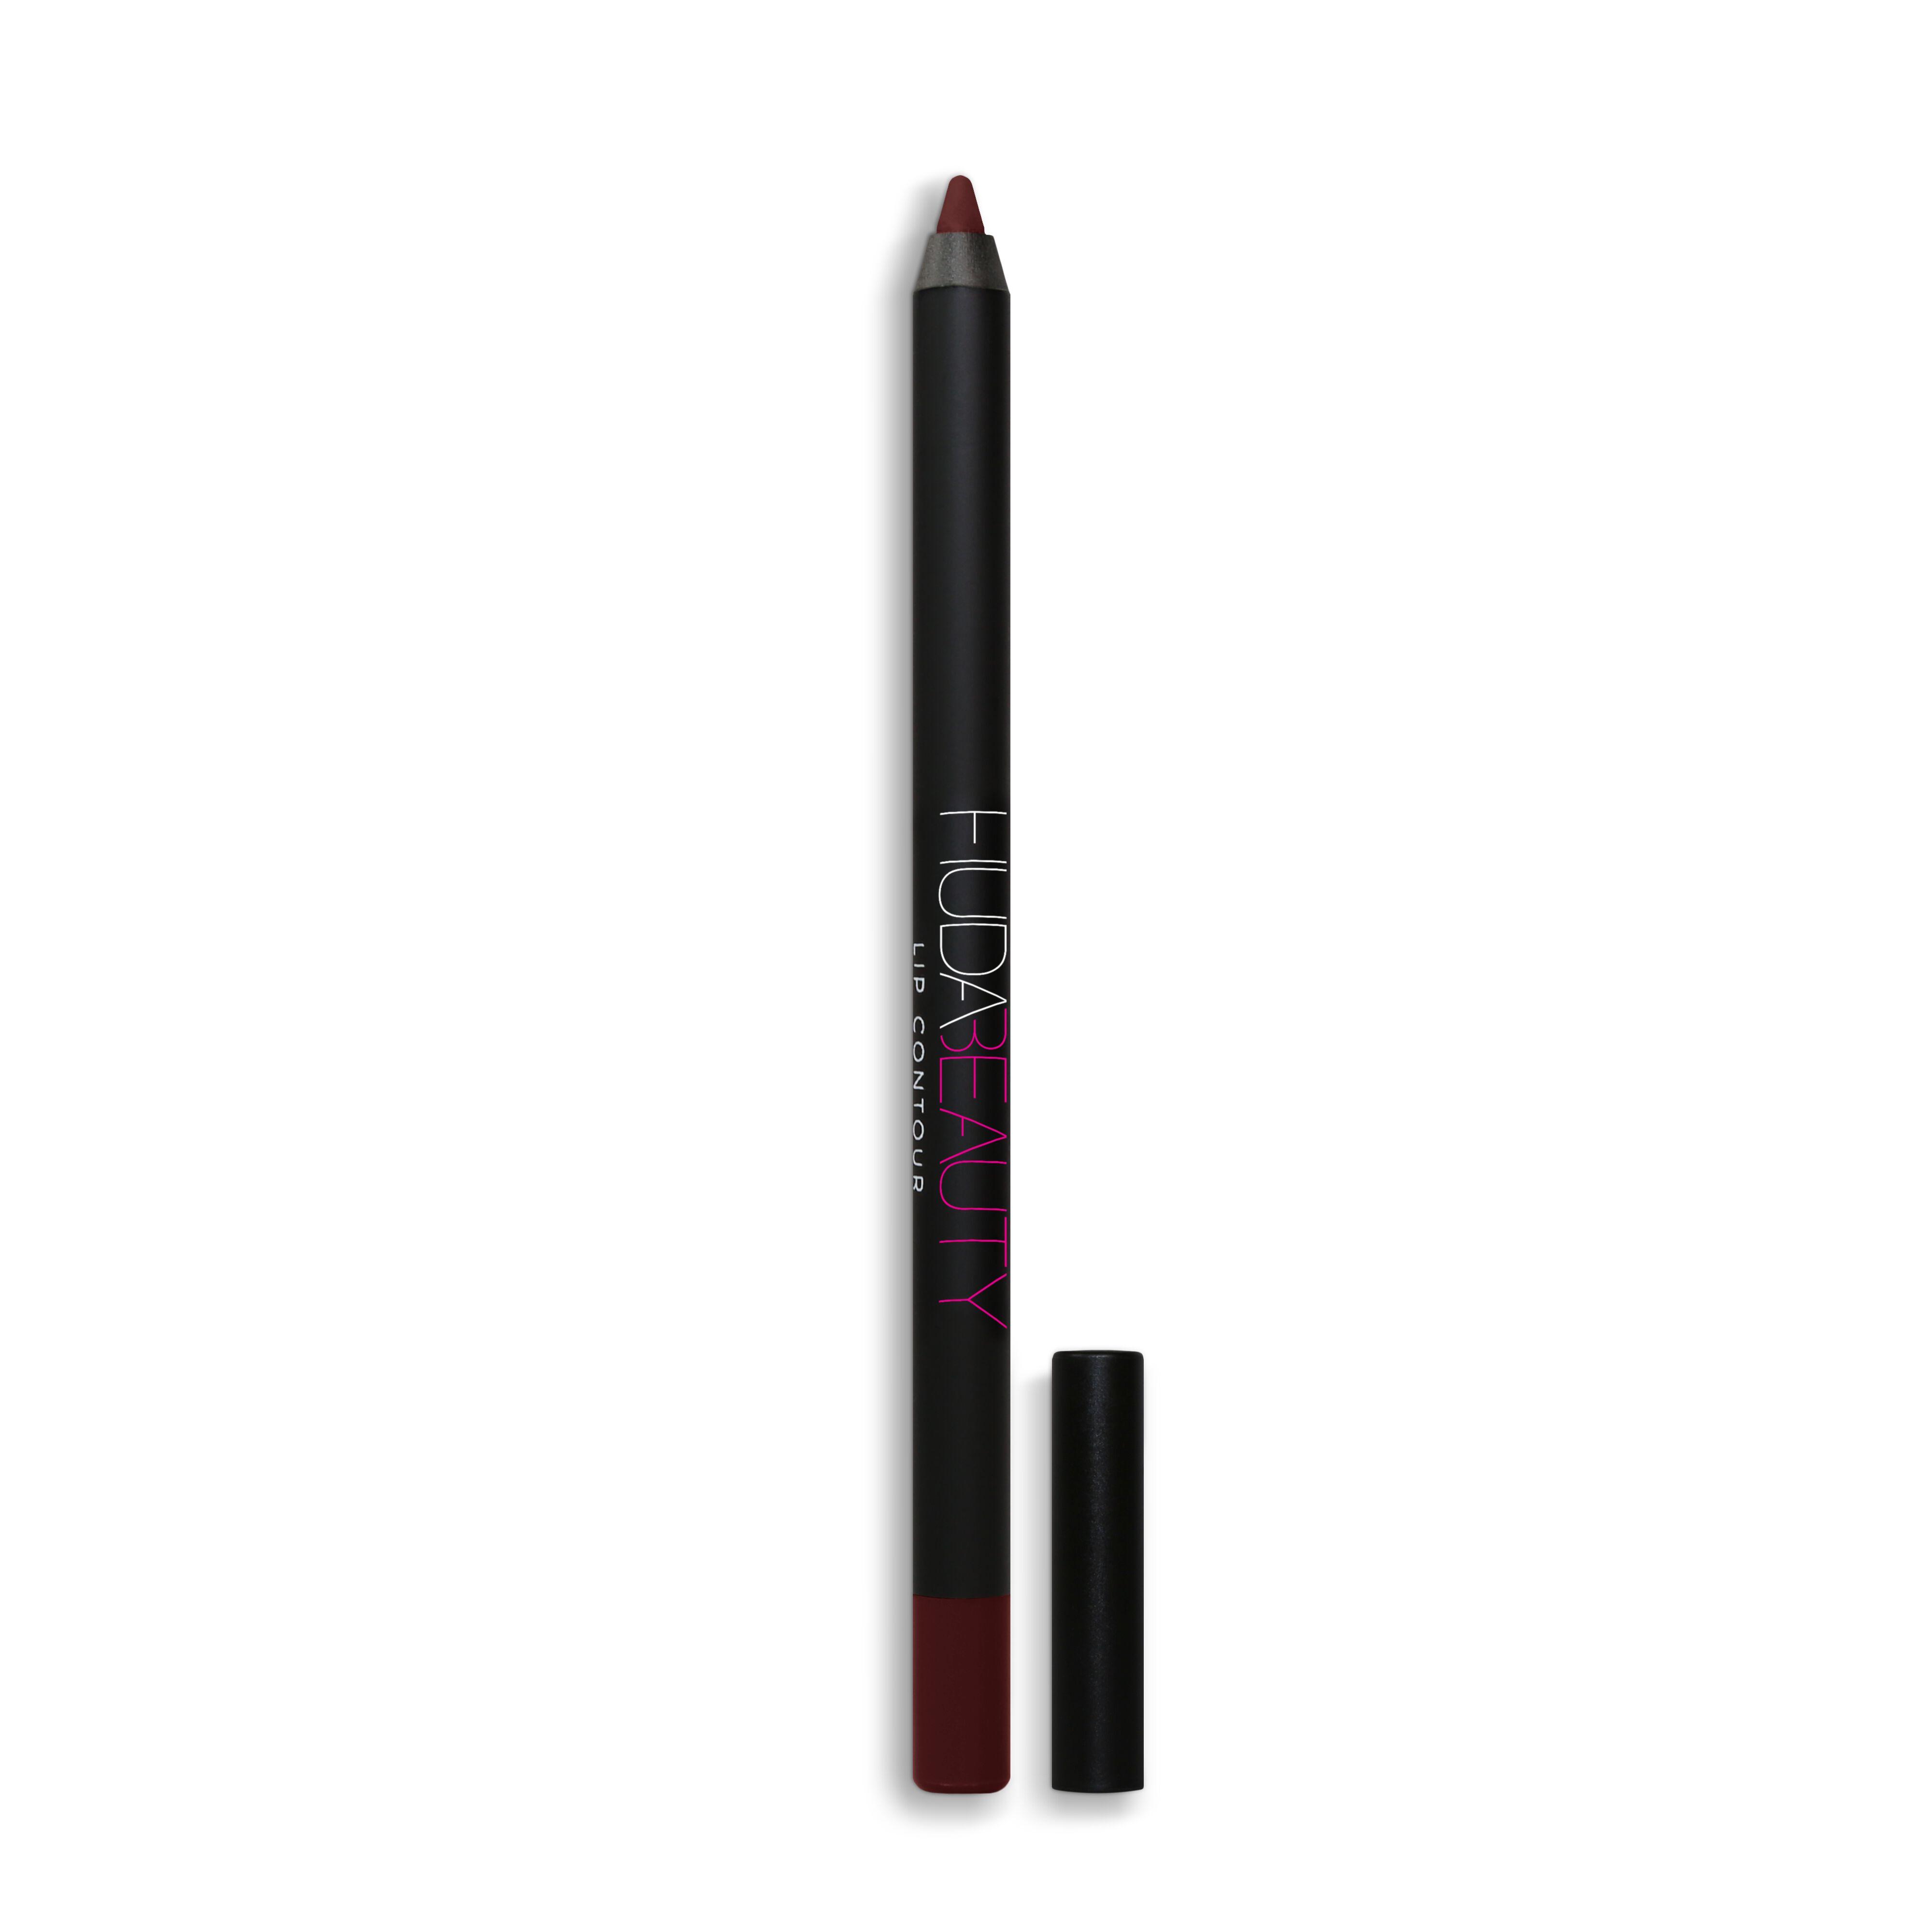 Huda Beauty Lip Contour in Vixen - Shop Now